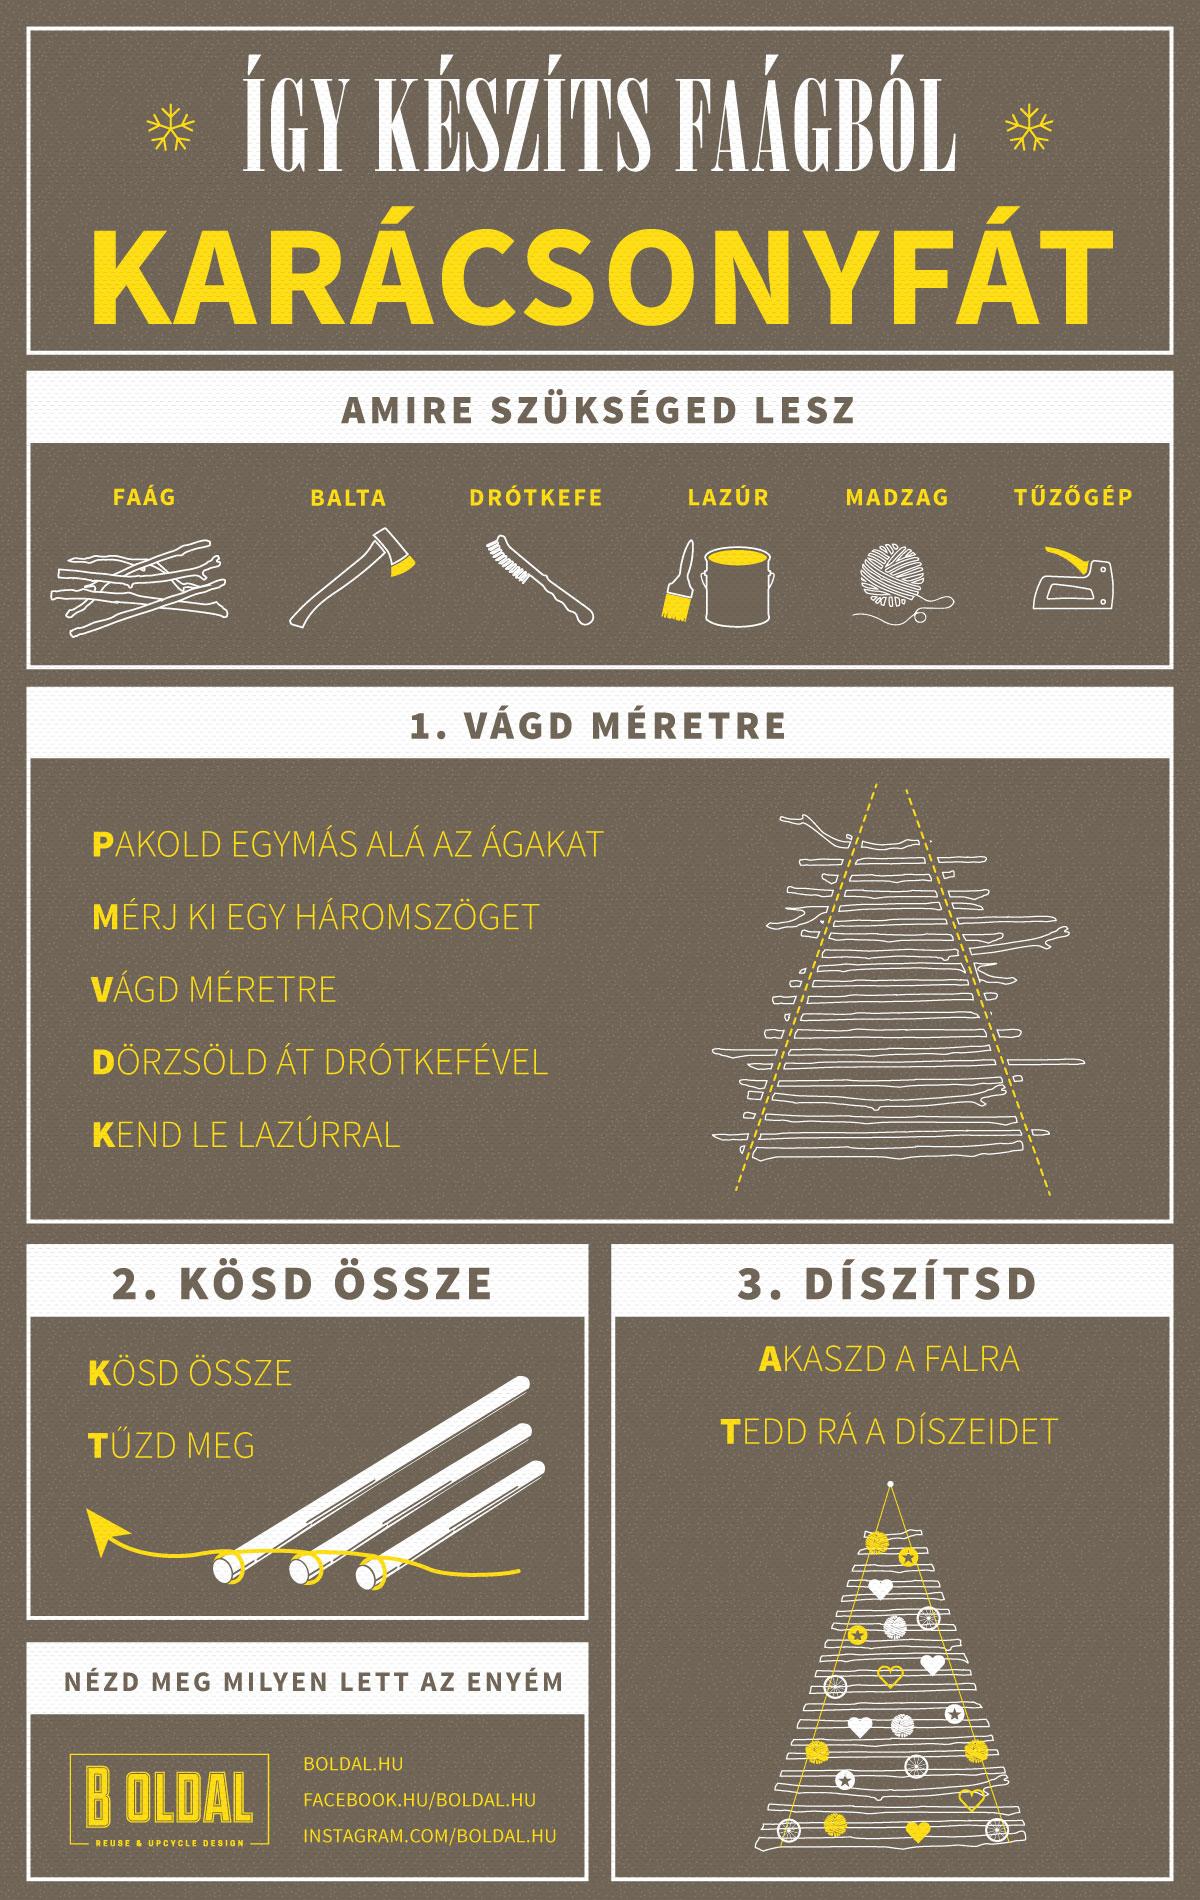 20-paradicsom-karobol-karacsonyfa-infographic-b-oldal.jpg